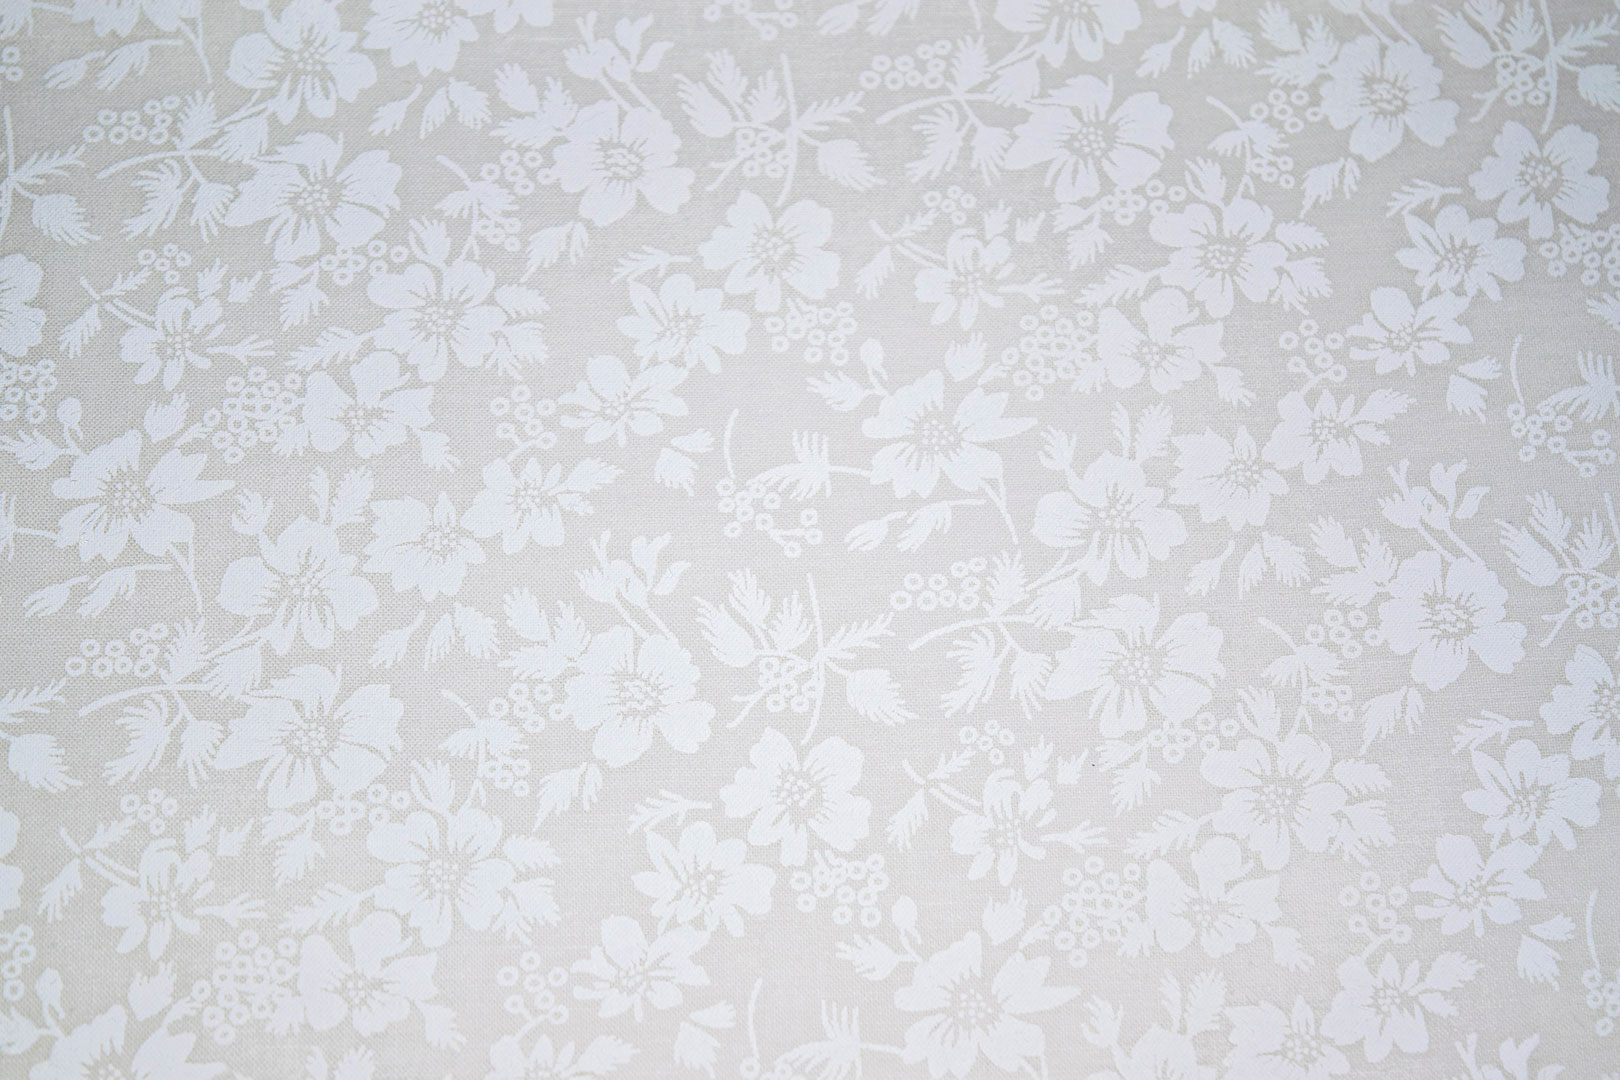 "8_18606_ww   44/45"" 68/68, 100% Carded Cotton"